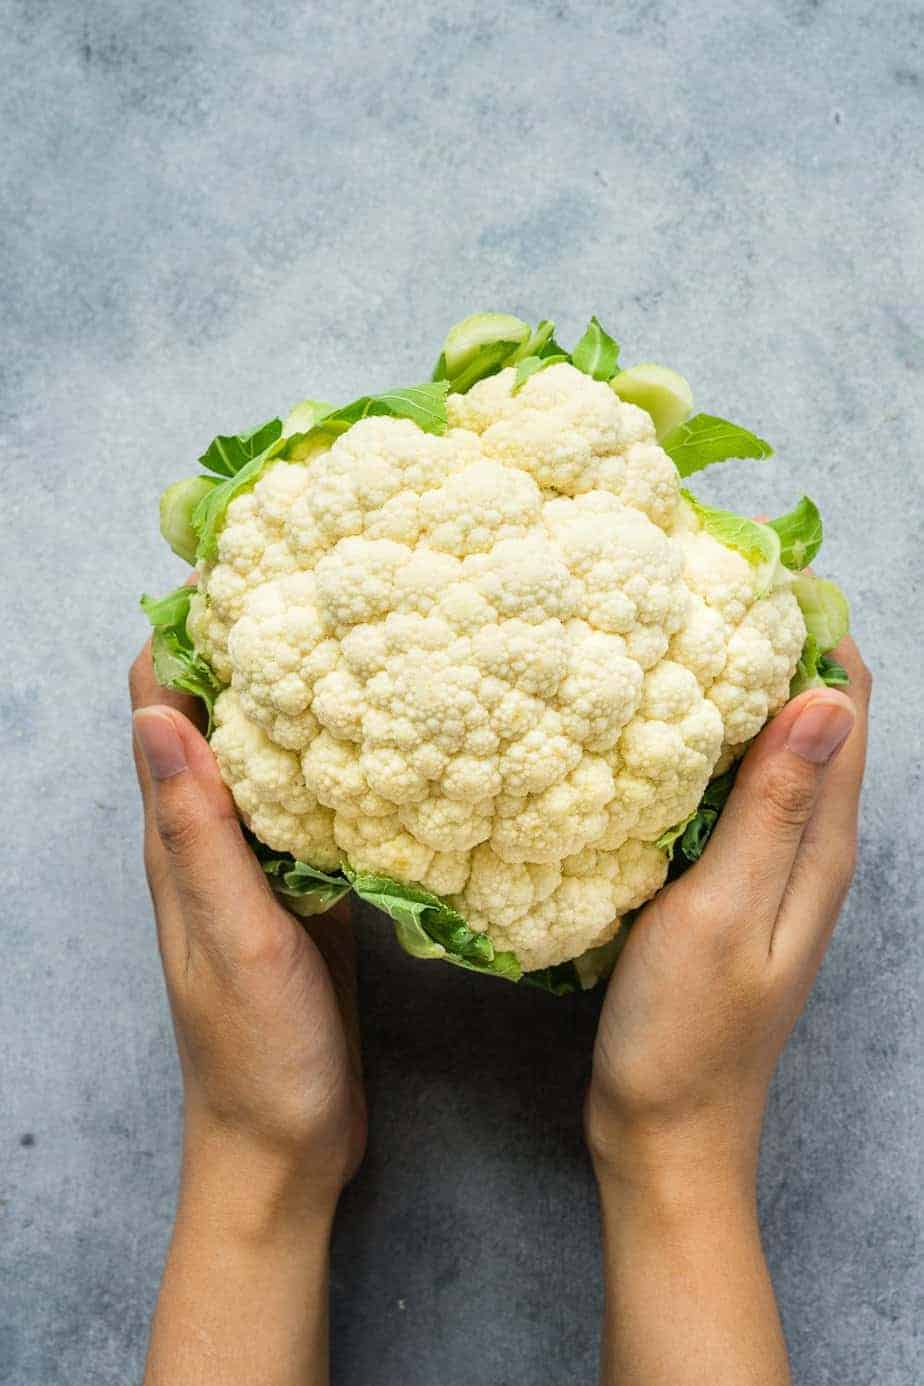 holding a head of cauliflower